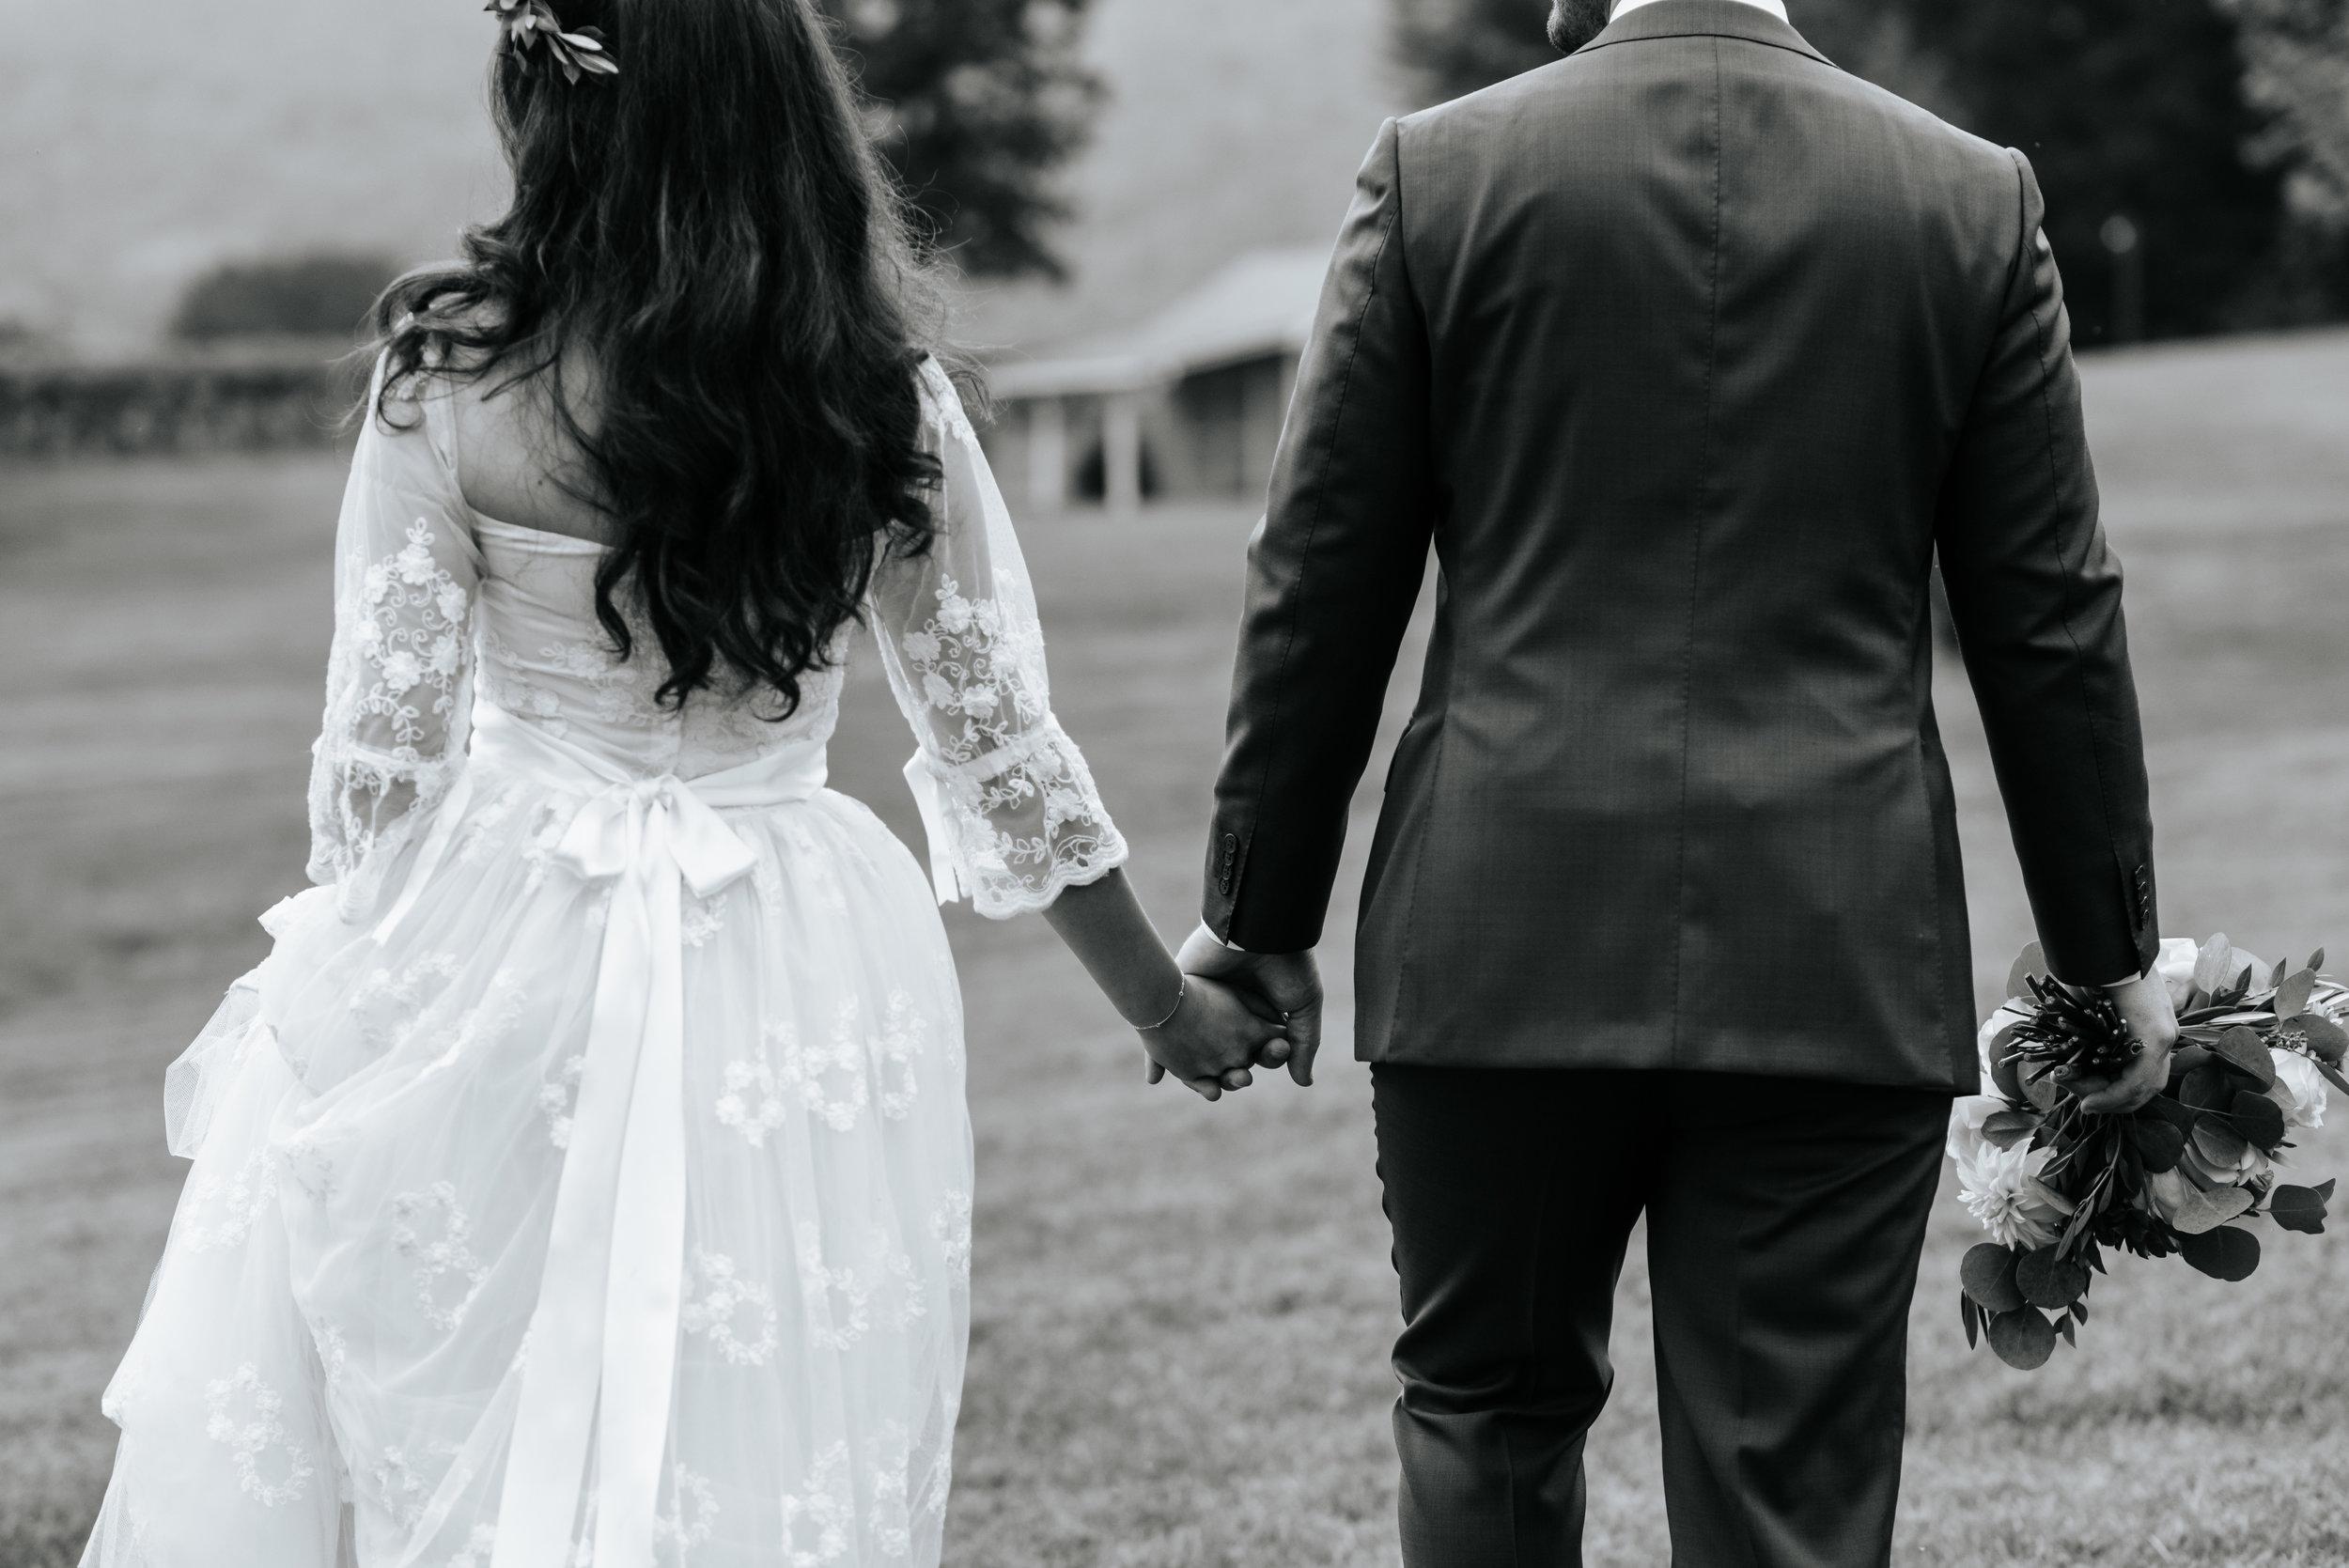 Veritas-Vineyards-and-Winery-Wedding-Photography-Afton-Virginia-Yasmin-Seth-Photography-by-V-2592.jpg